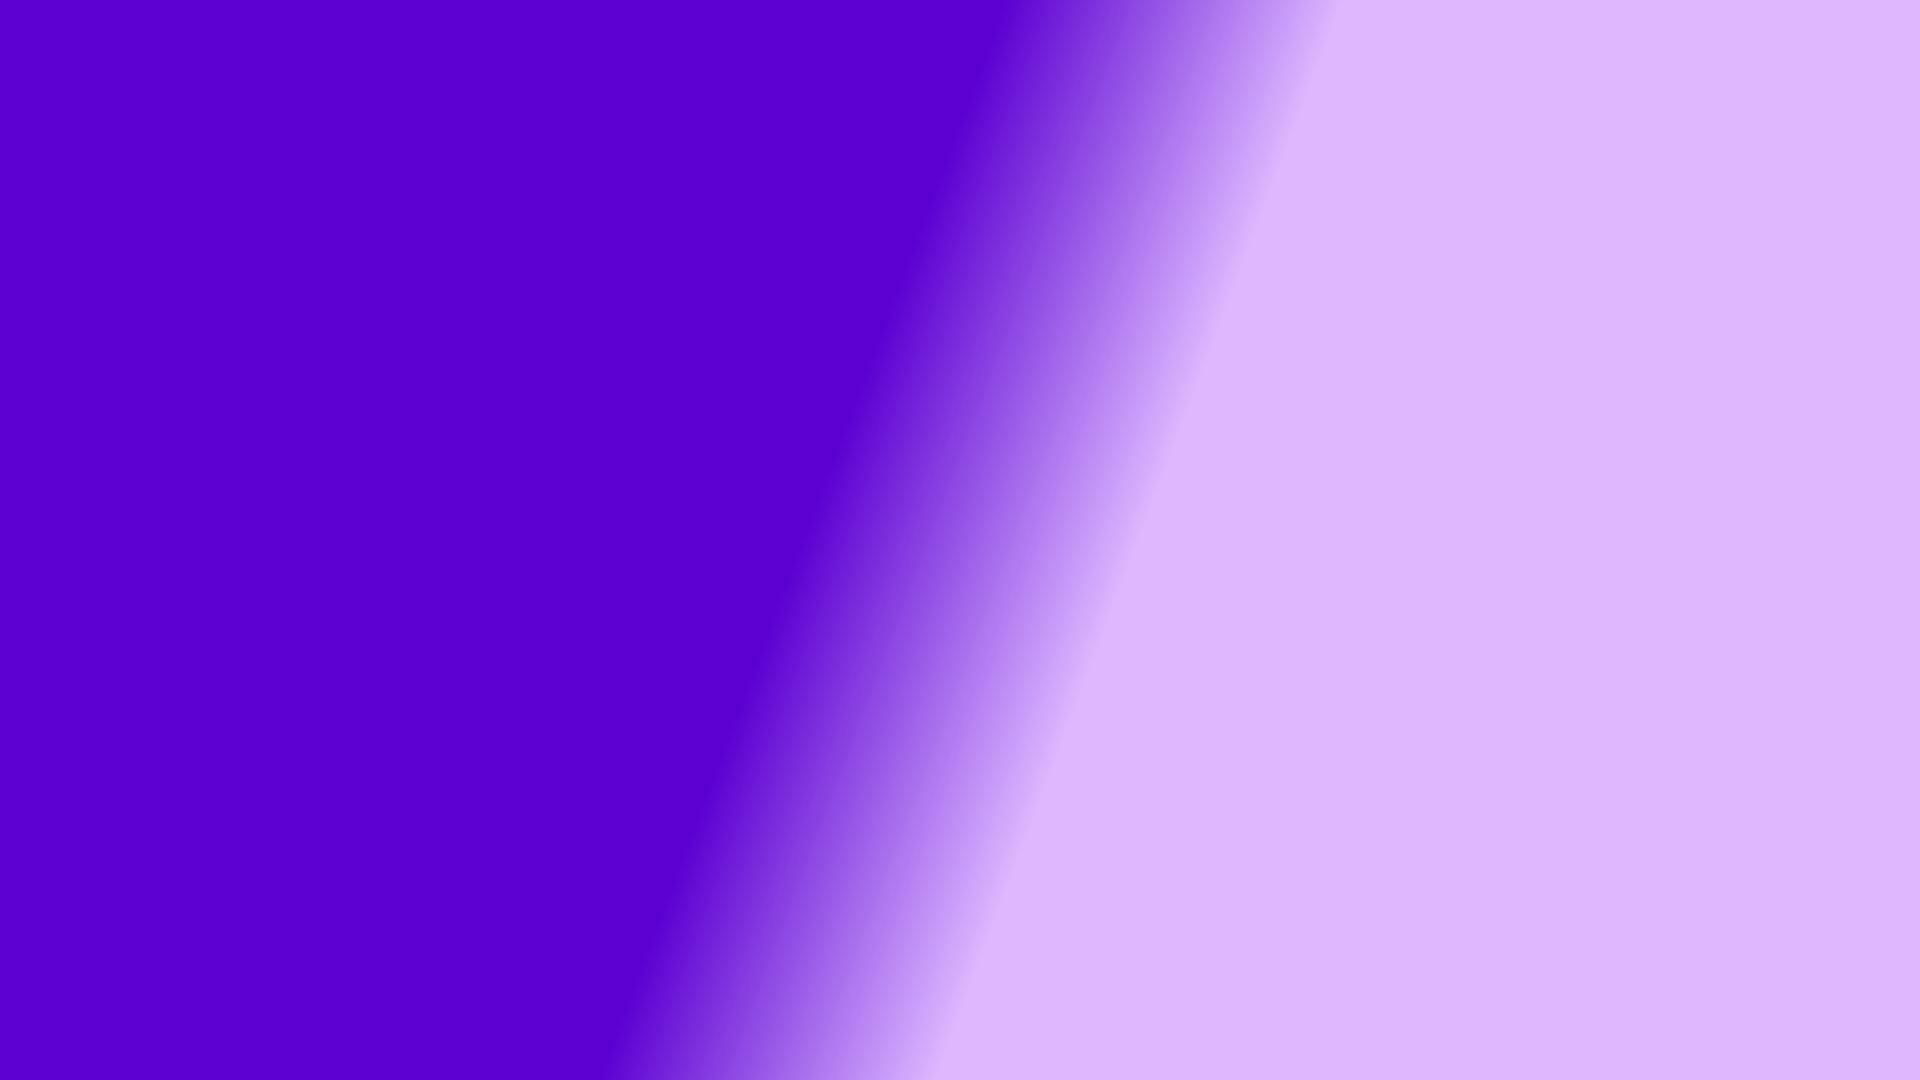 violet 2.0 Gradient